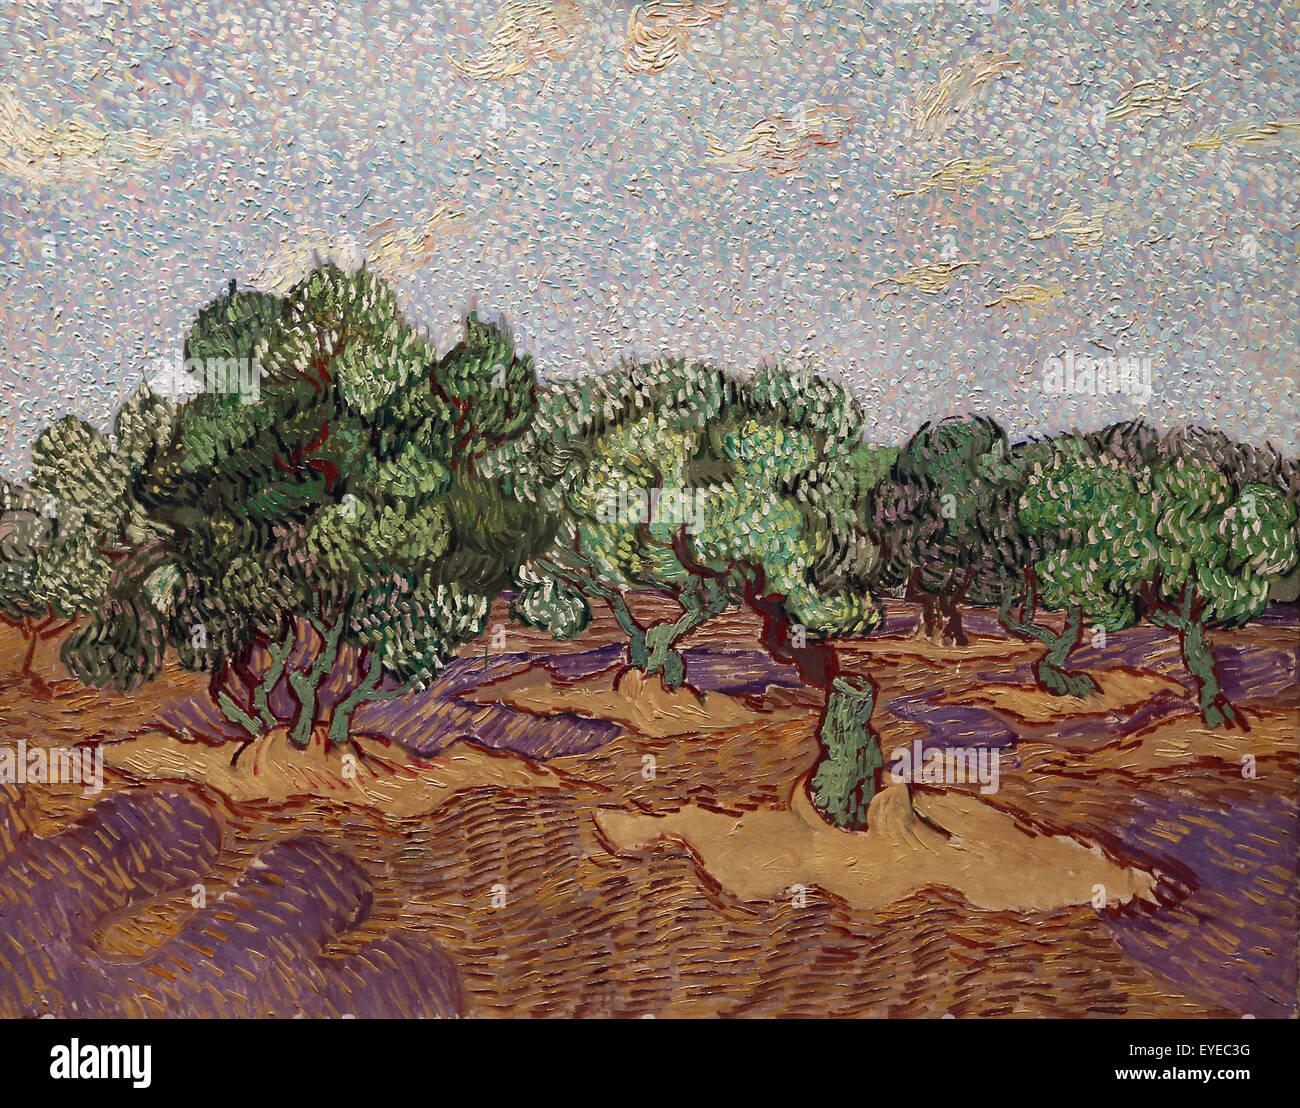 Vincent van Gogh (1853-1890). Dutch painter. Olive Trees, 1889. Oil on canvas. Metropolitan Museum of Art. NY. USA. - Stock Image